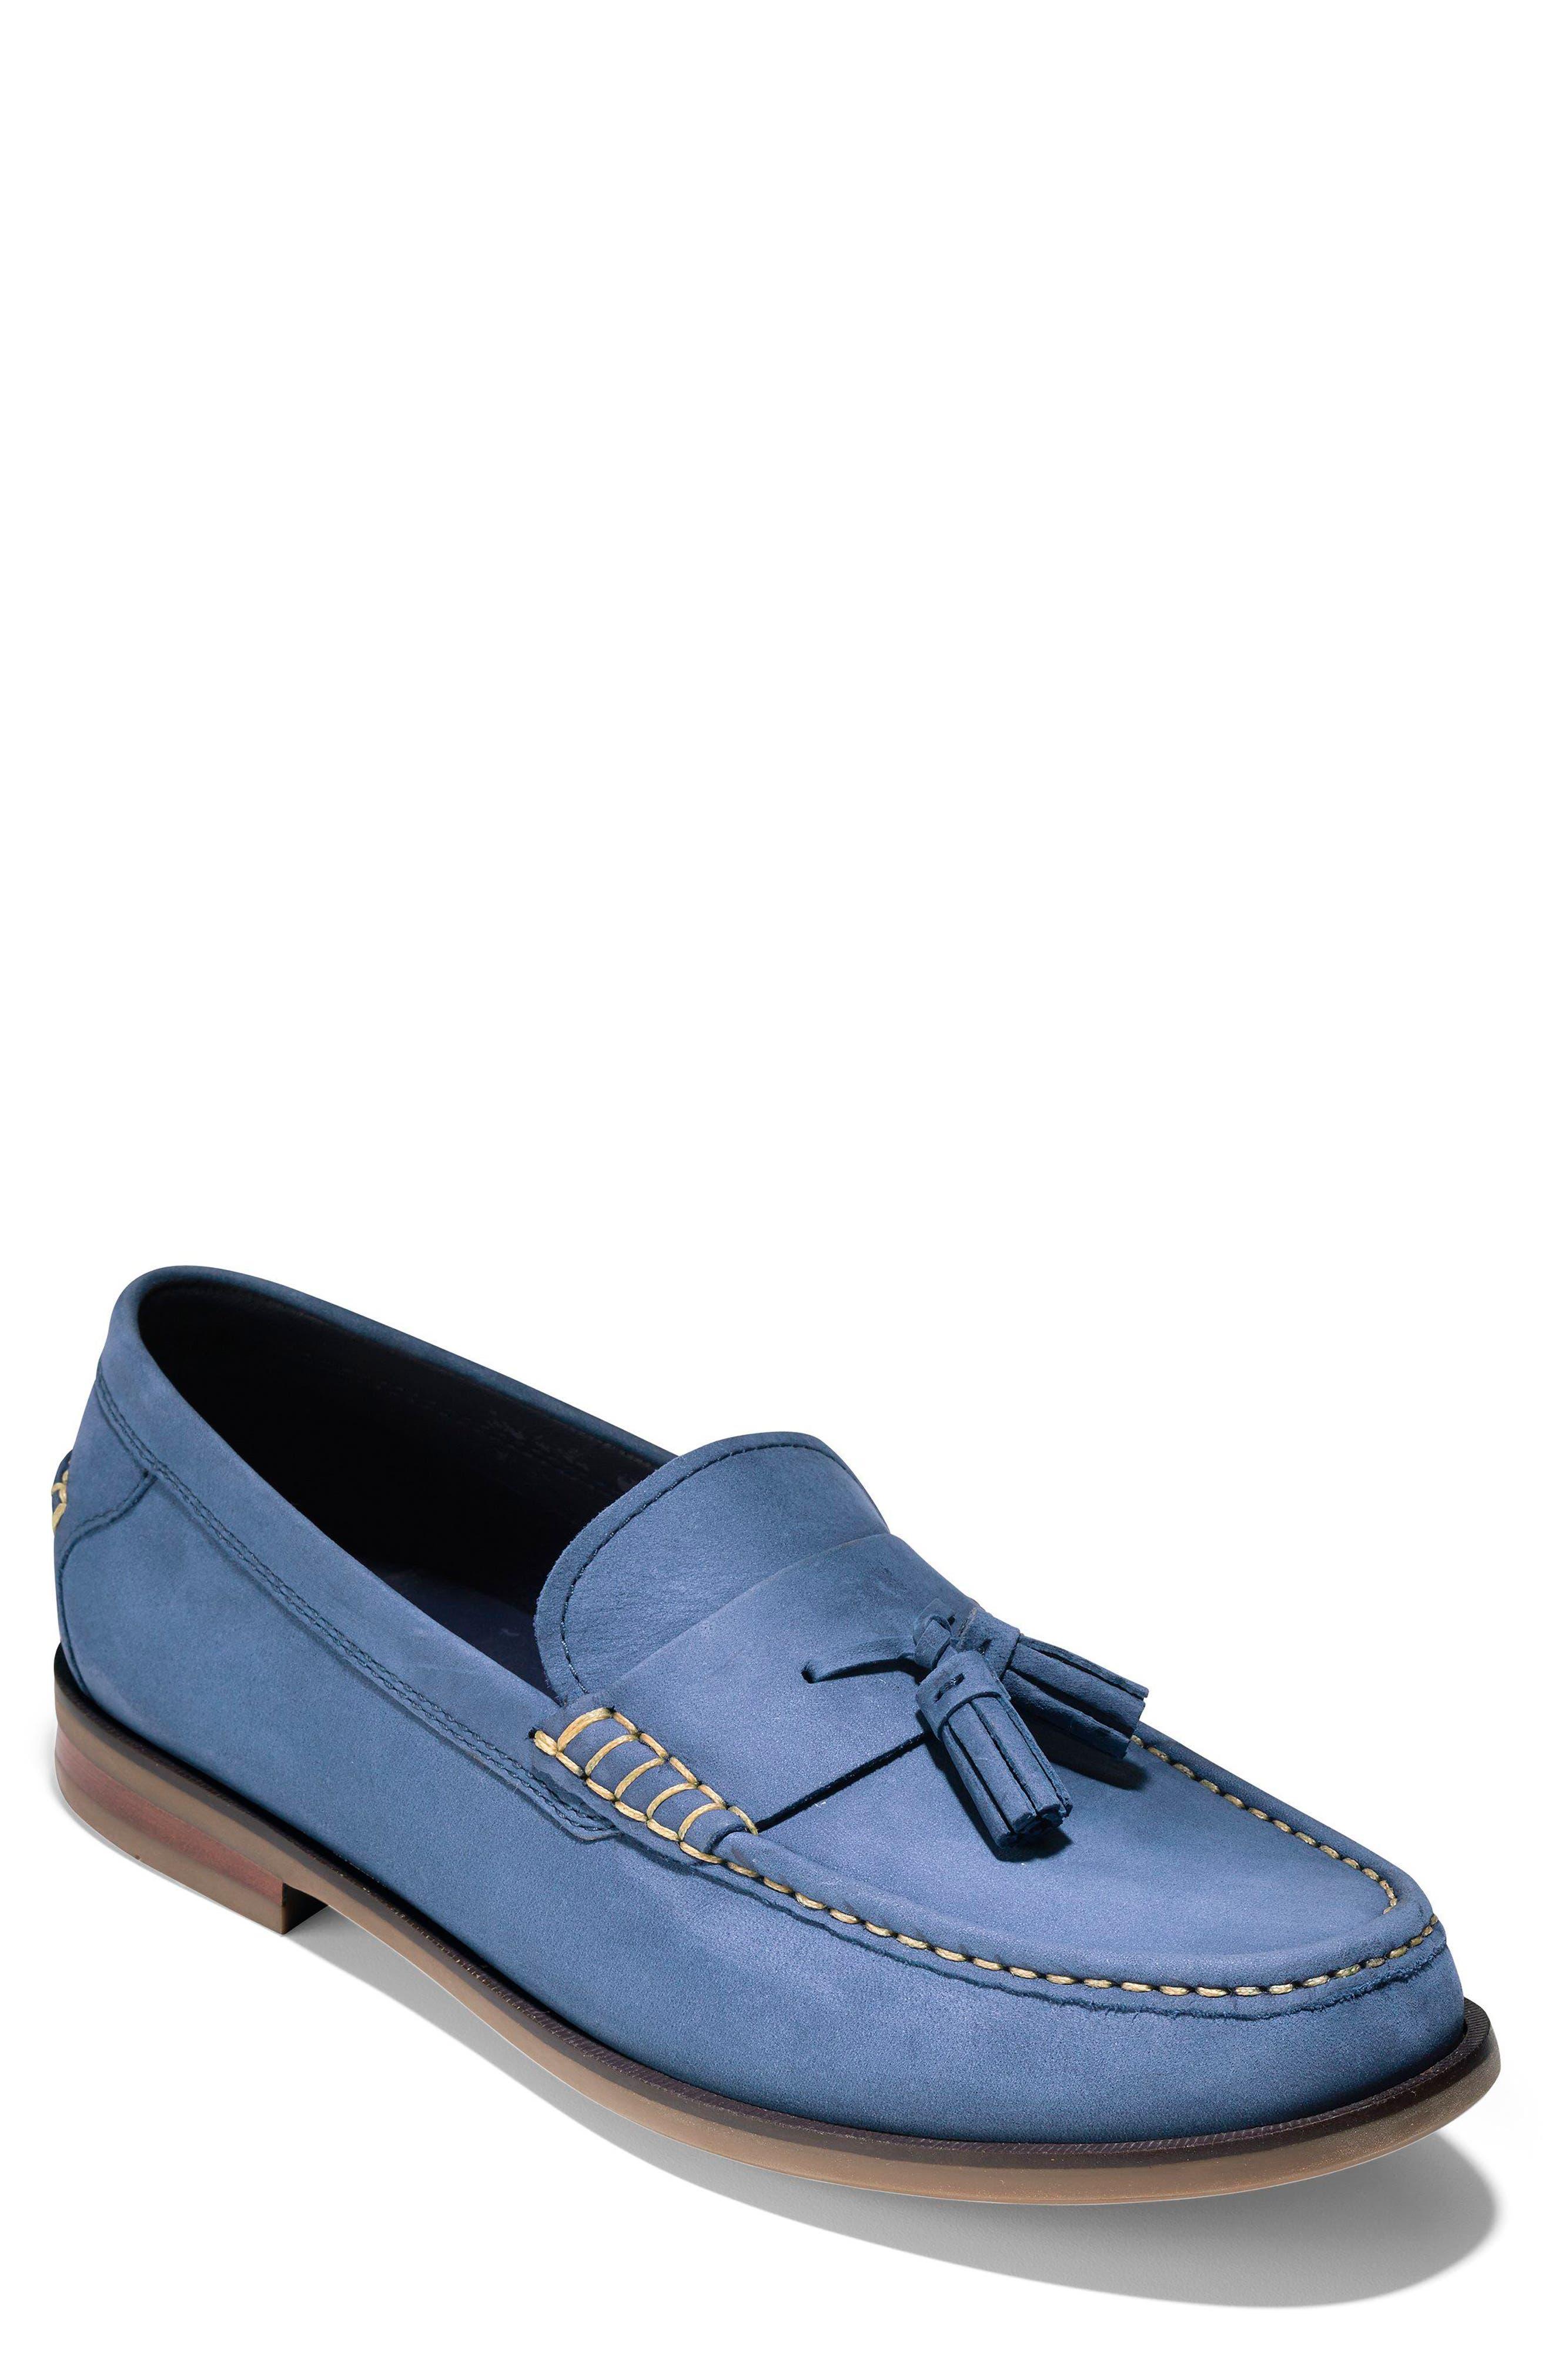 Pinch Friday Tassel Loafer,                         Main,                         color, Marine Blue Nubuck